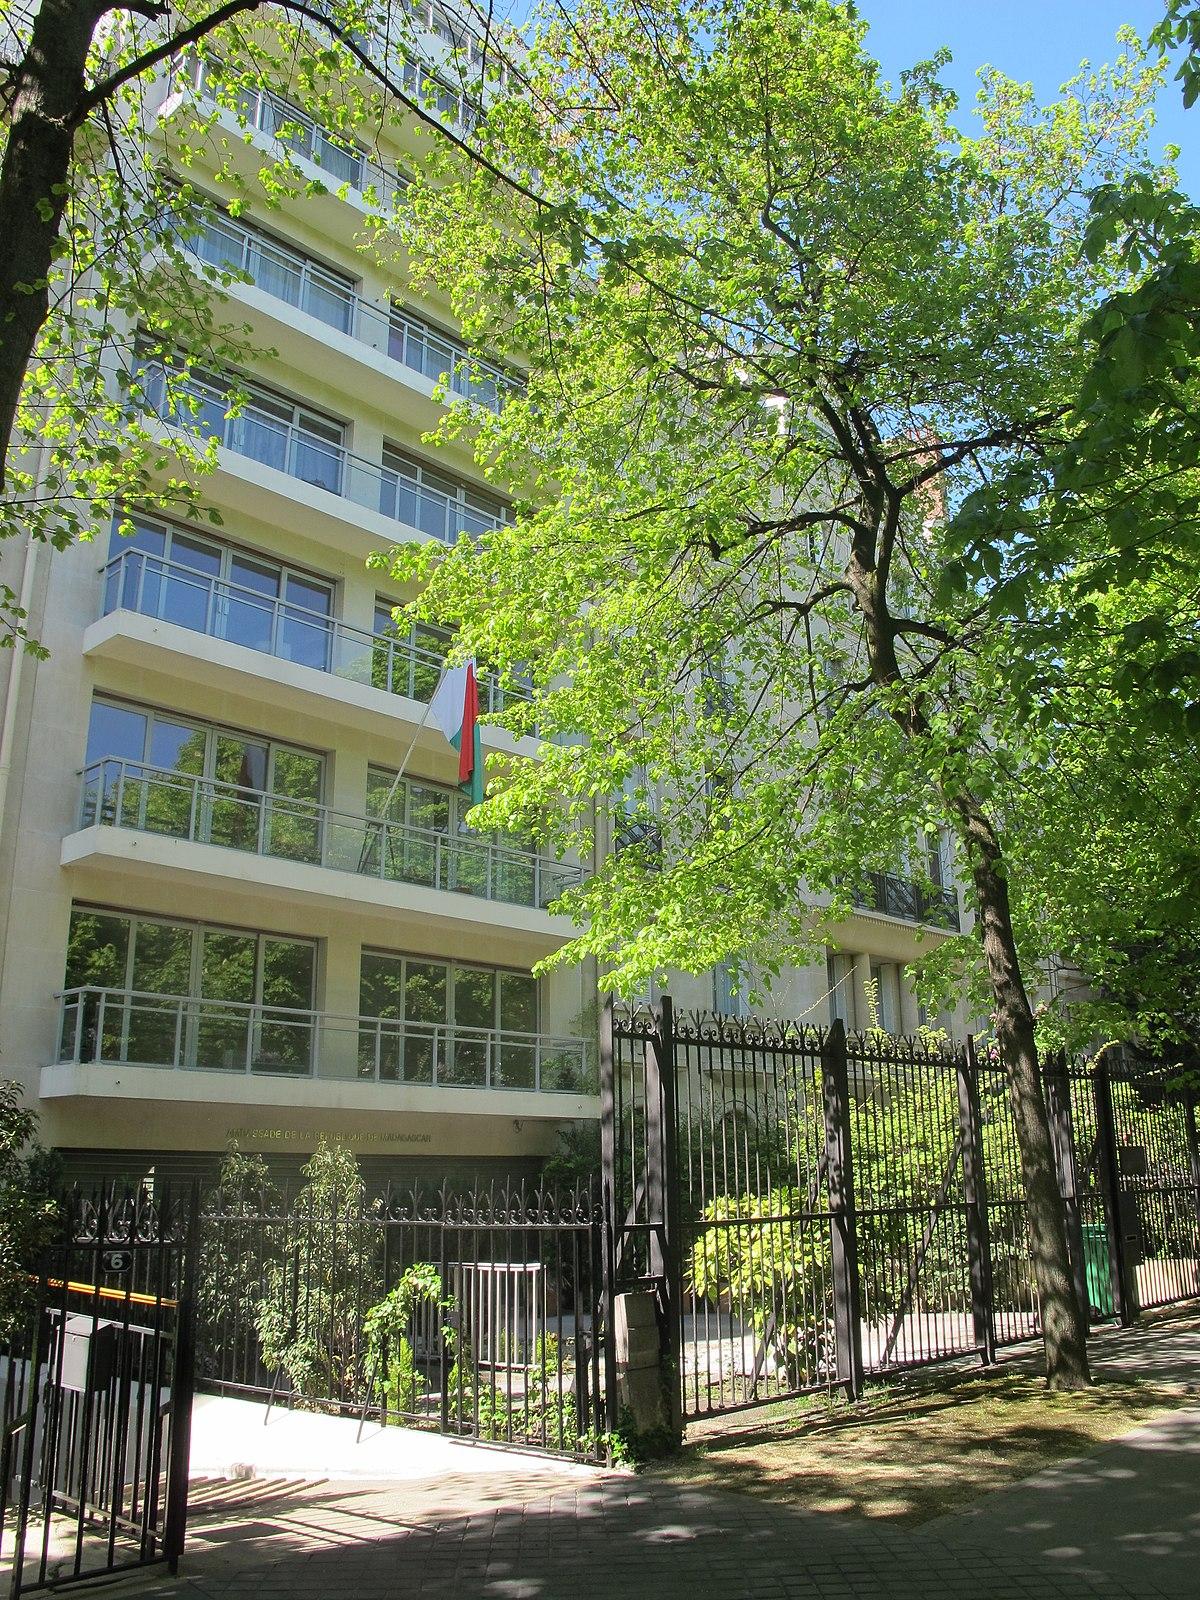 ambassade de madagascar en france  u2014 wikip u00e9dia